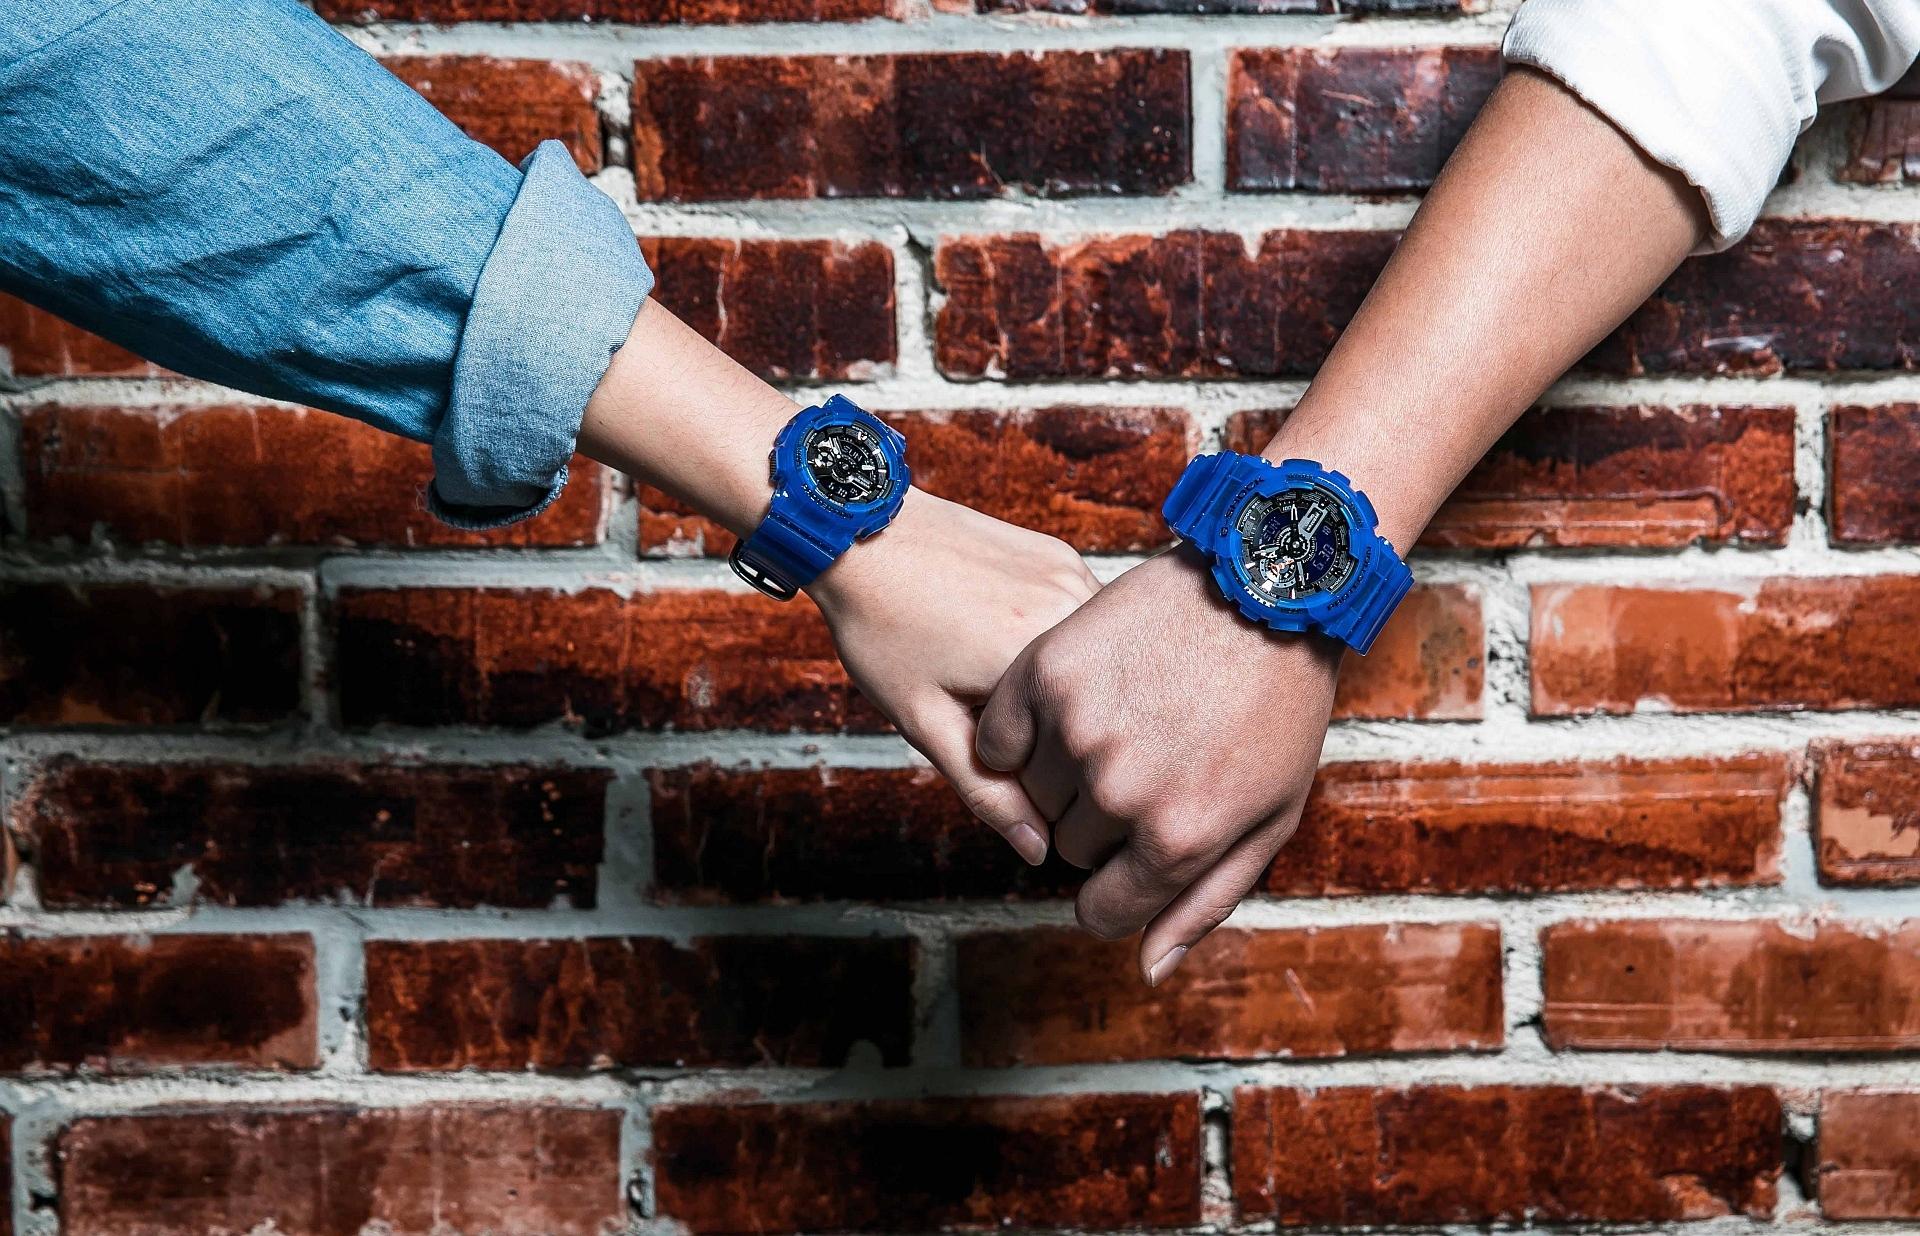 以「CORAL REEF COLOR」為主題的海洋生態設計風格:G-SHOCK & BABY-G 2018透明感情侶對錶